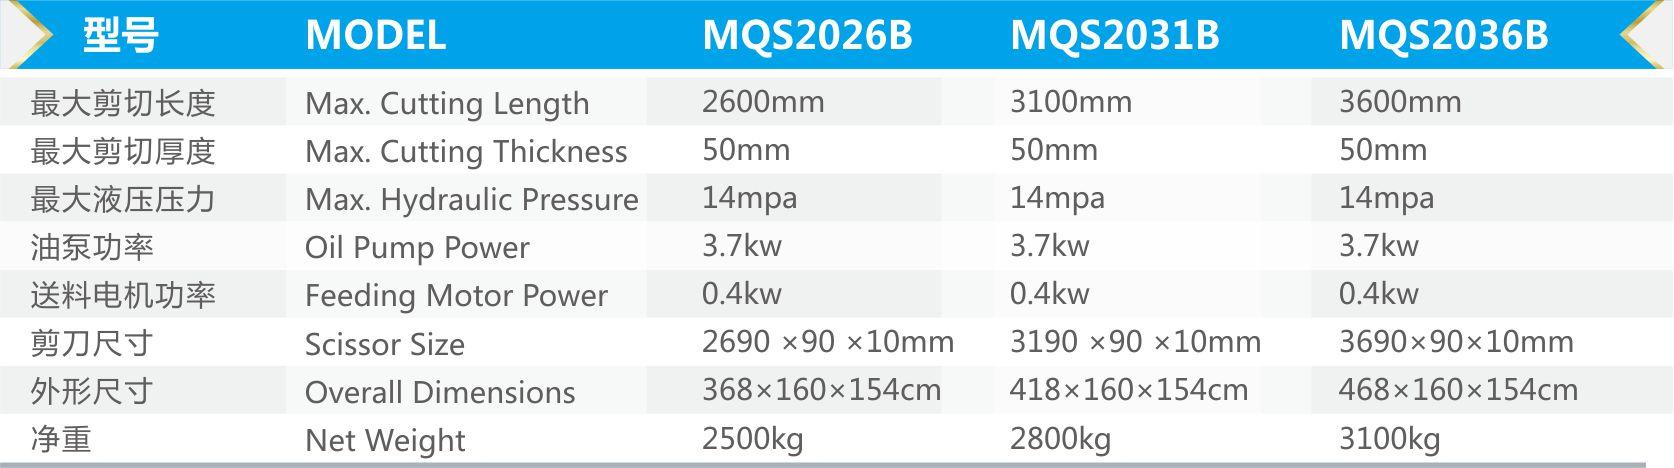 MQS单板设备技术参数.jpg